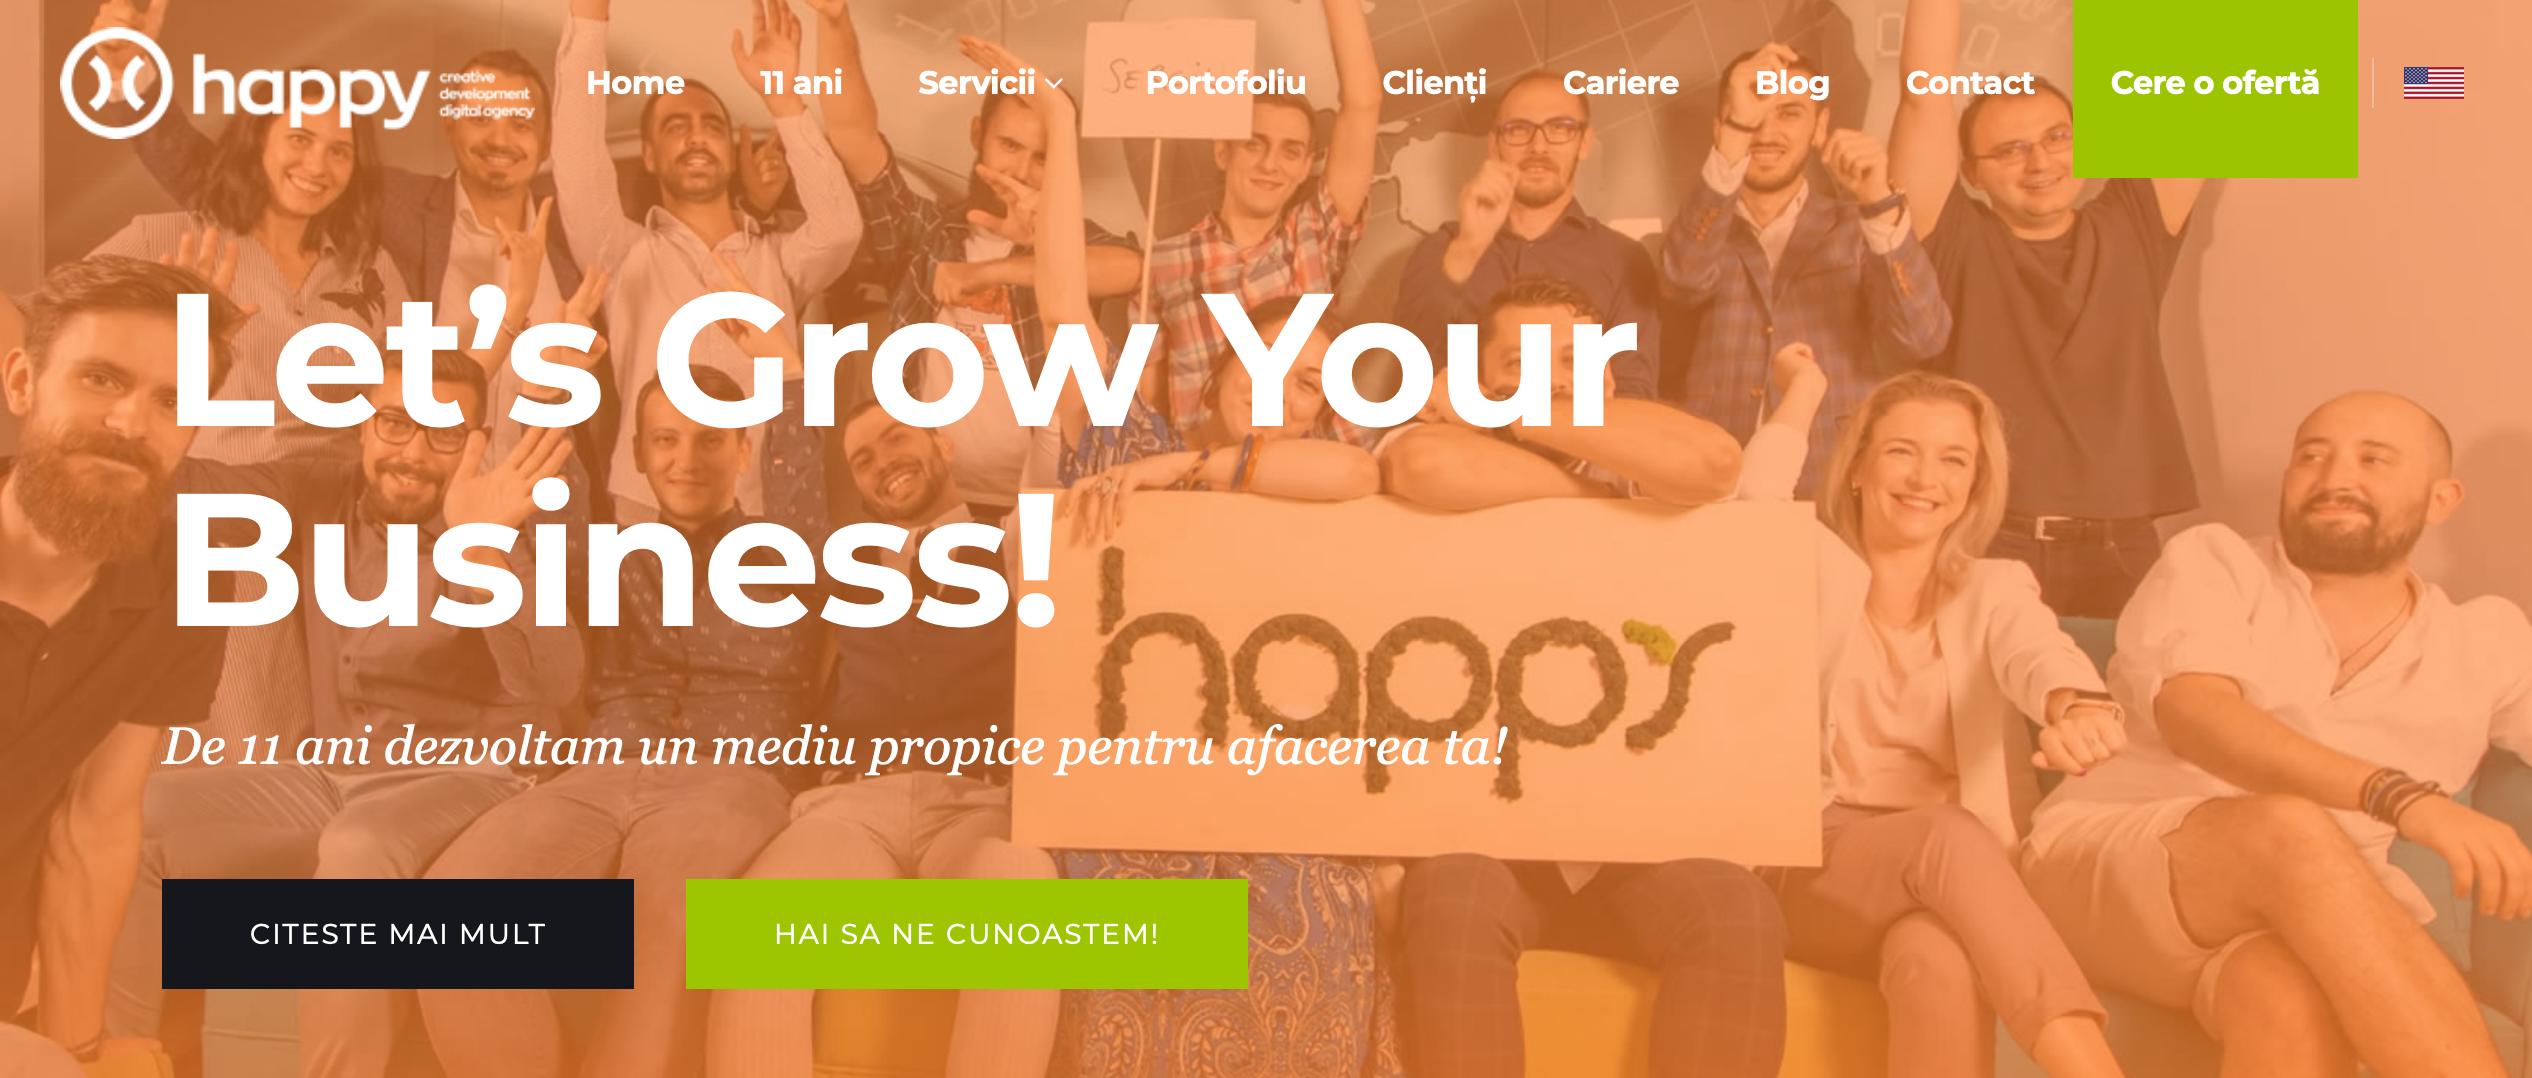 agentie web design happyadv